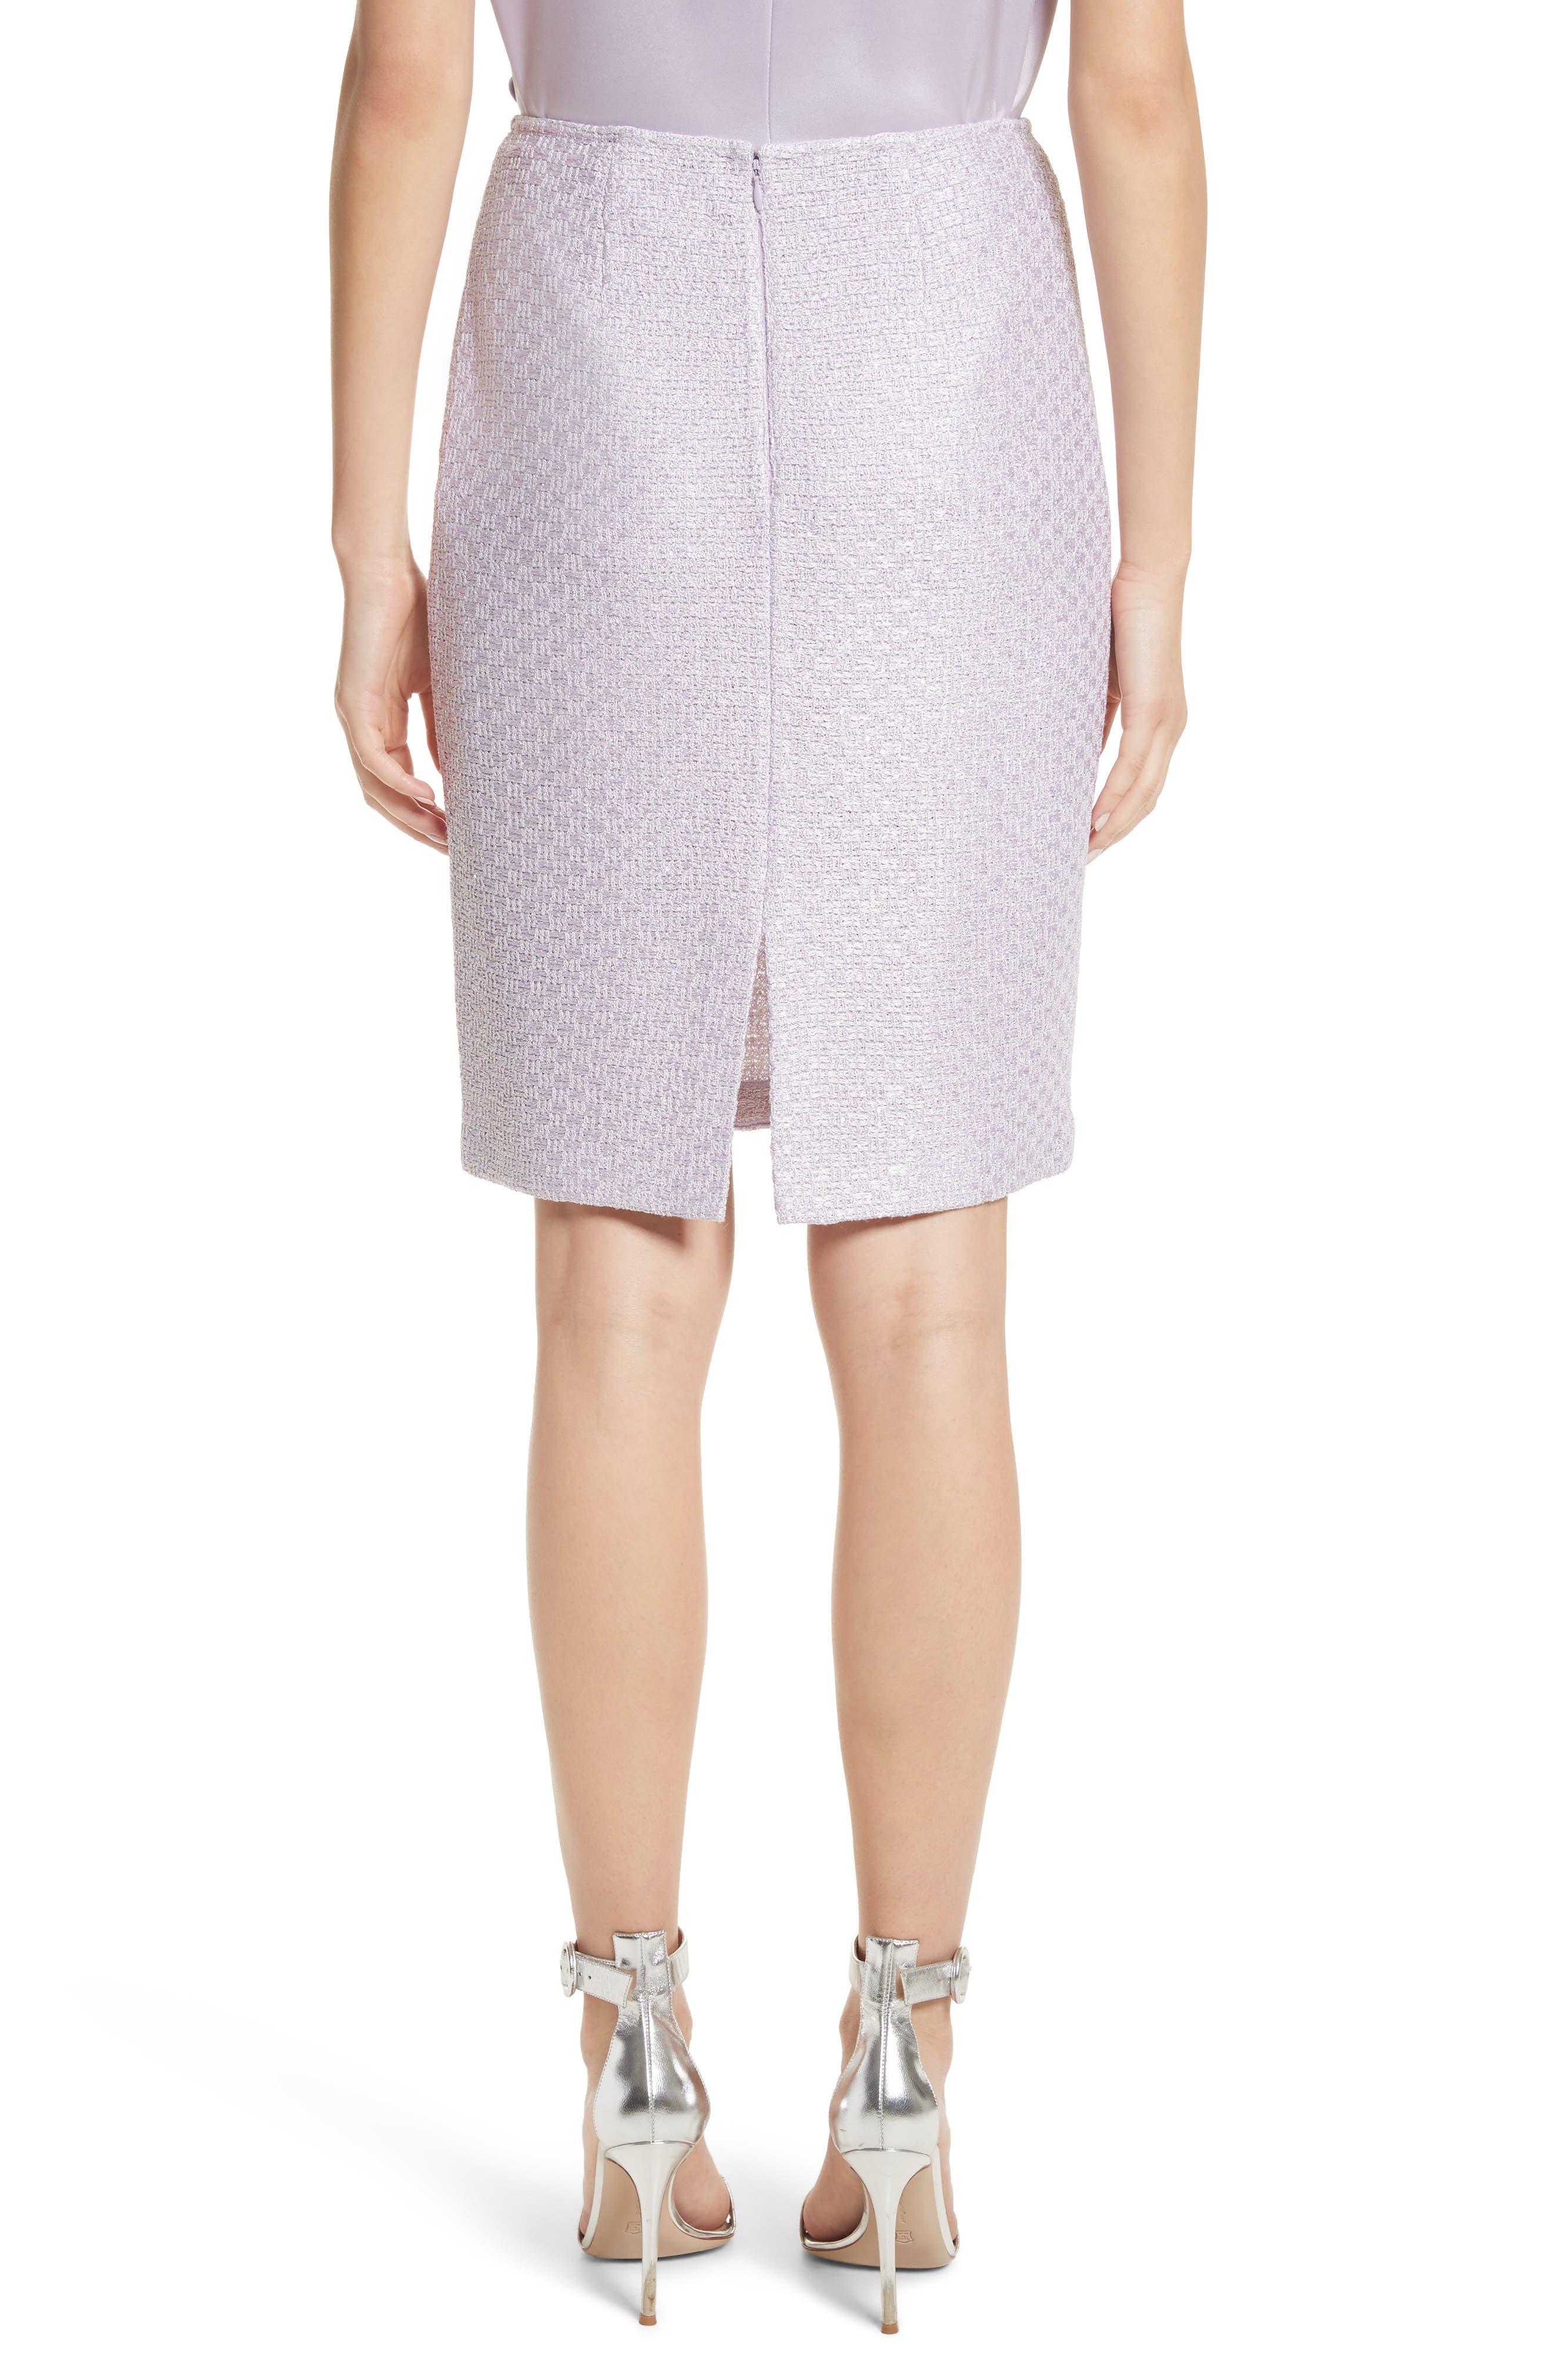 Hansh Sequin Knit Pencil Skirt,                             Alternate thumbnail 2, color,